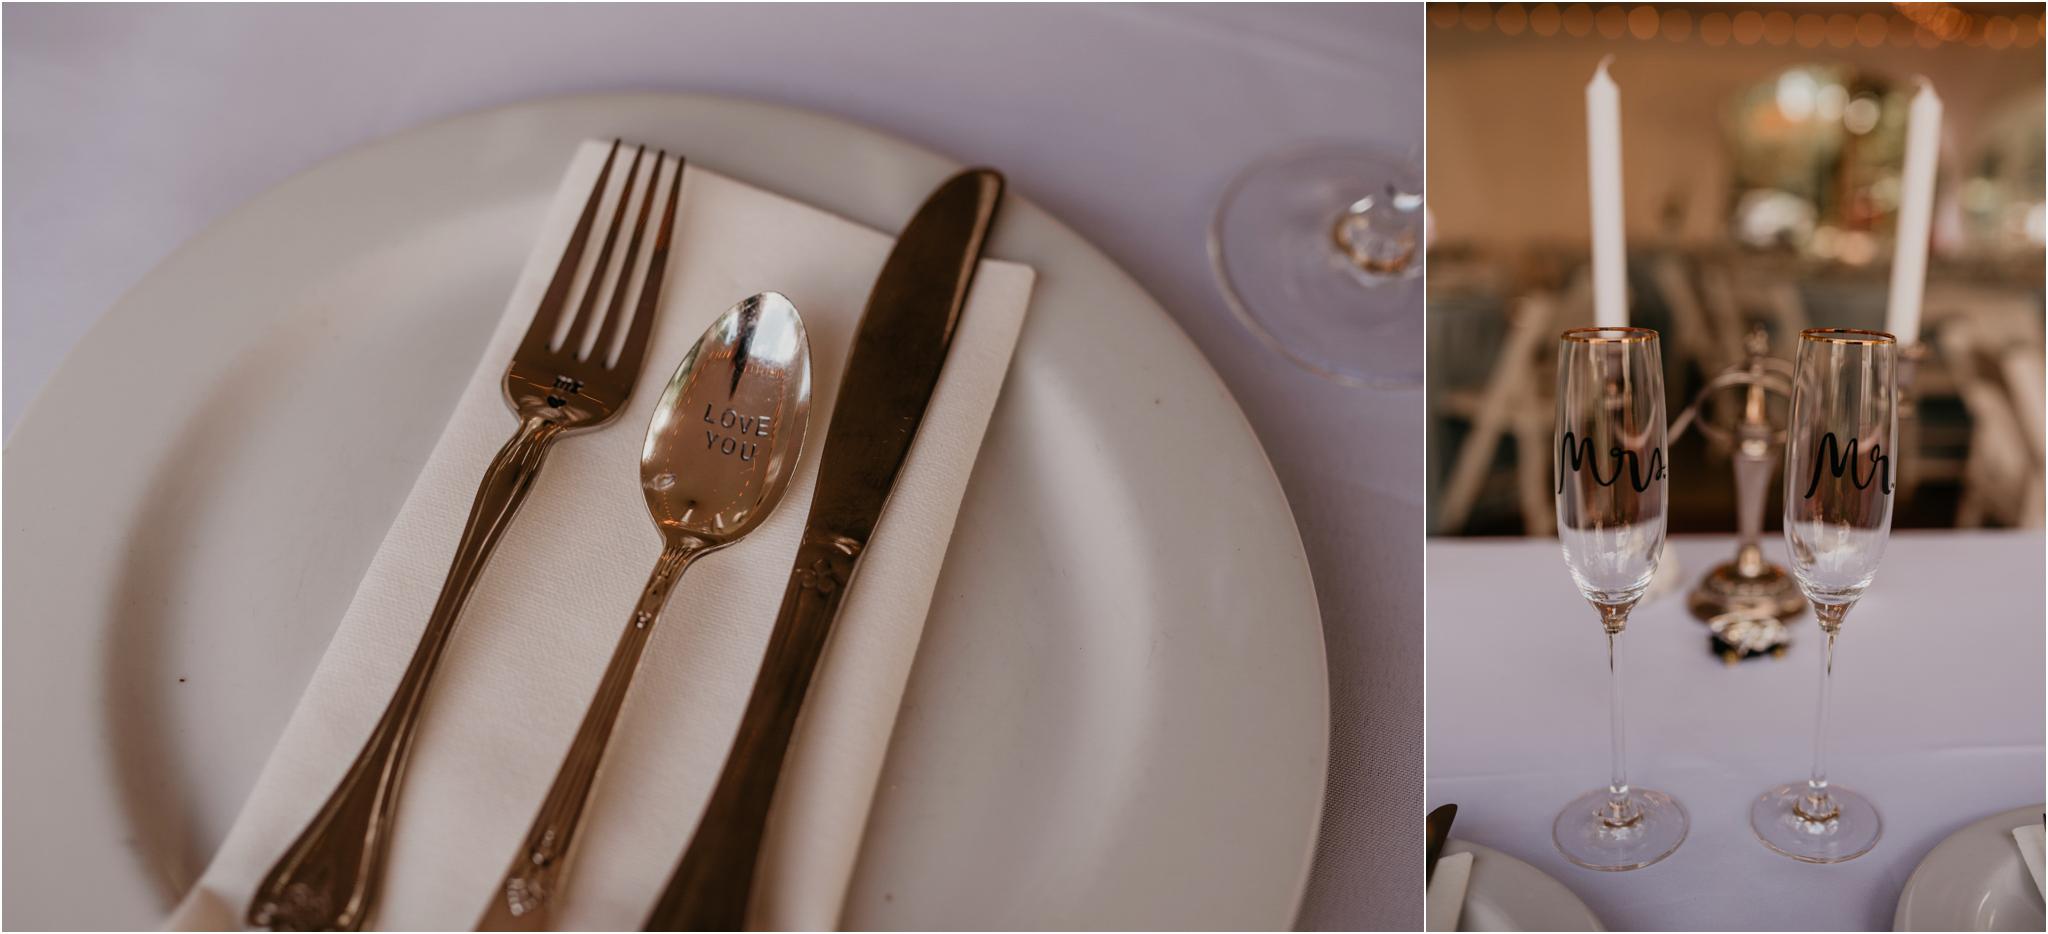 chance-and-ondrea-lairmont-manor-wedding-seattle-photographer-066.jpg